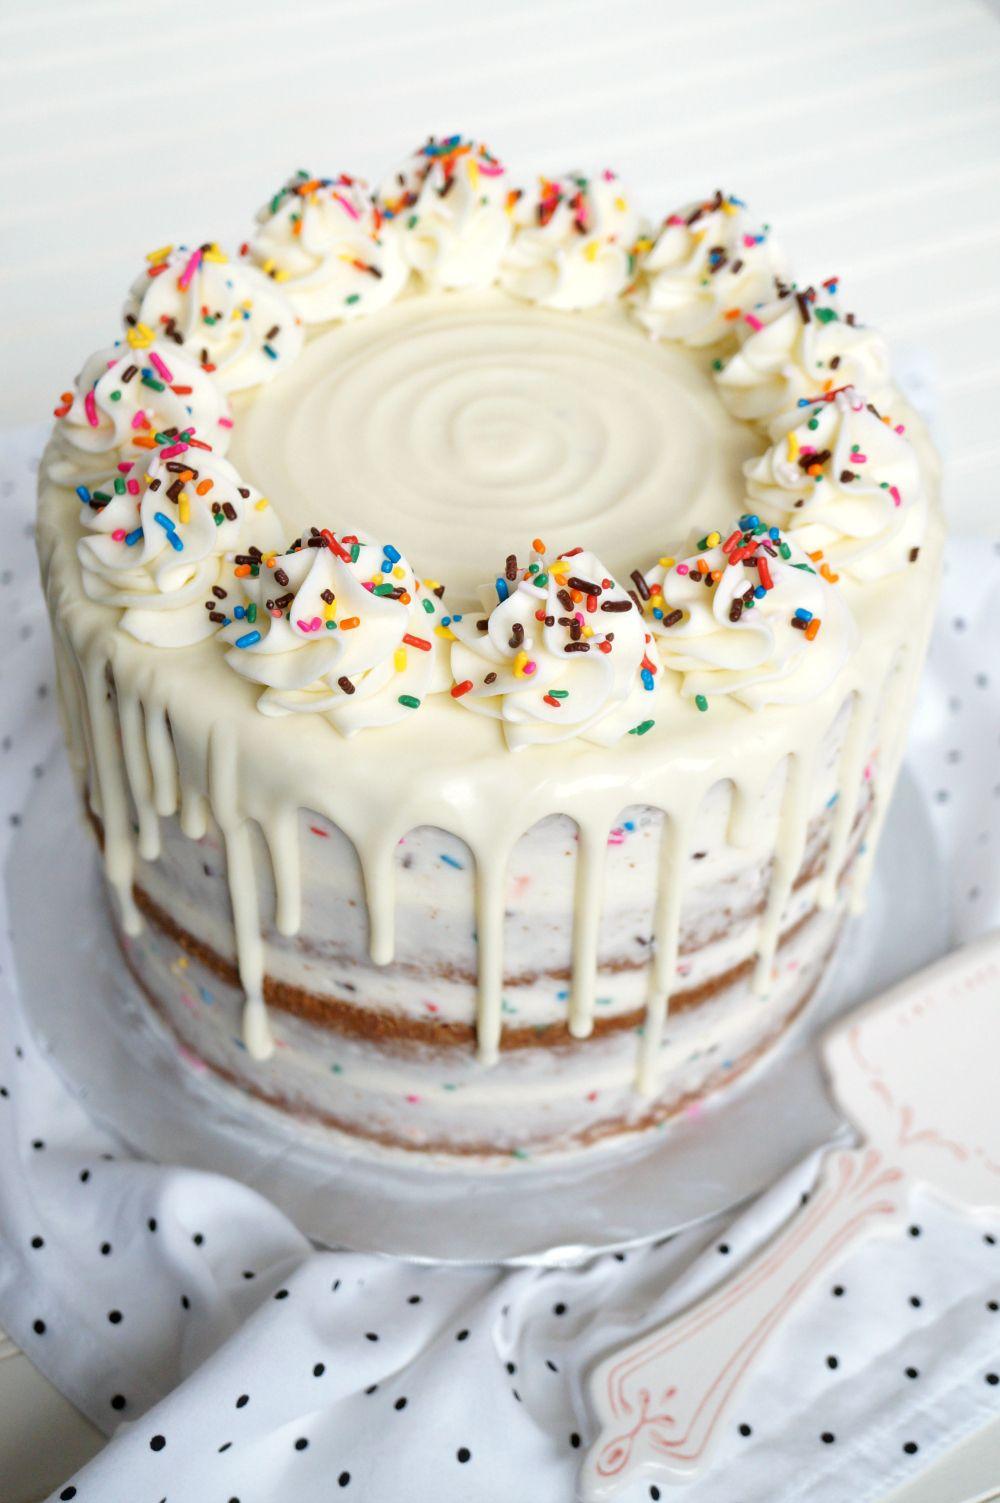 layered confetti drip cake | The Baking Fairy